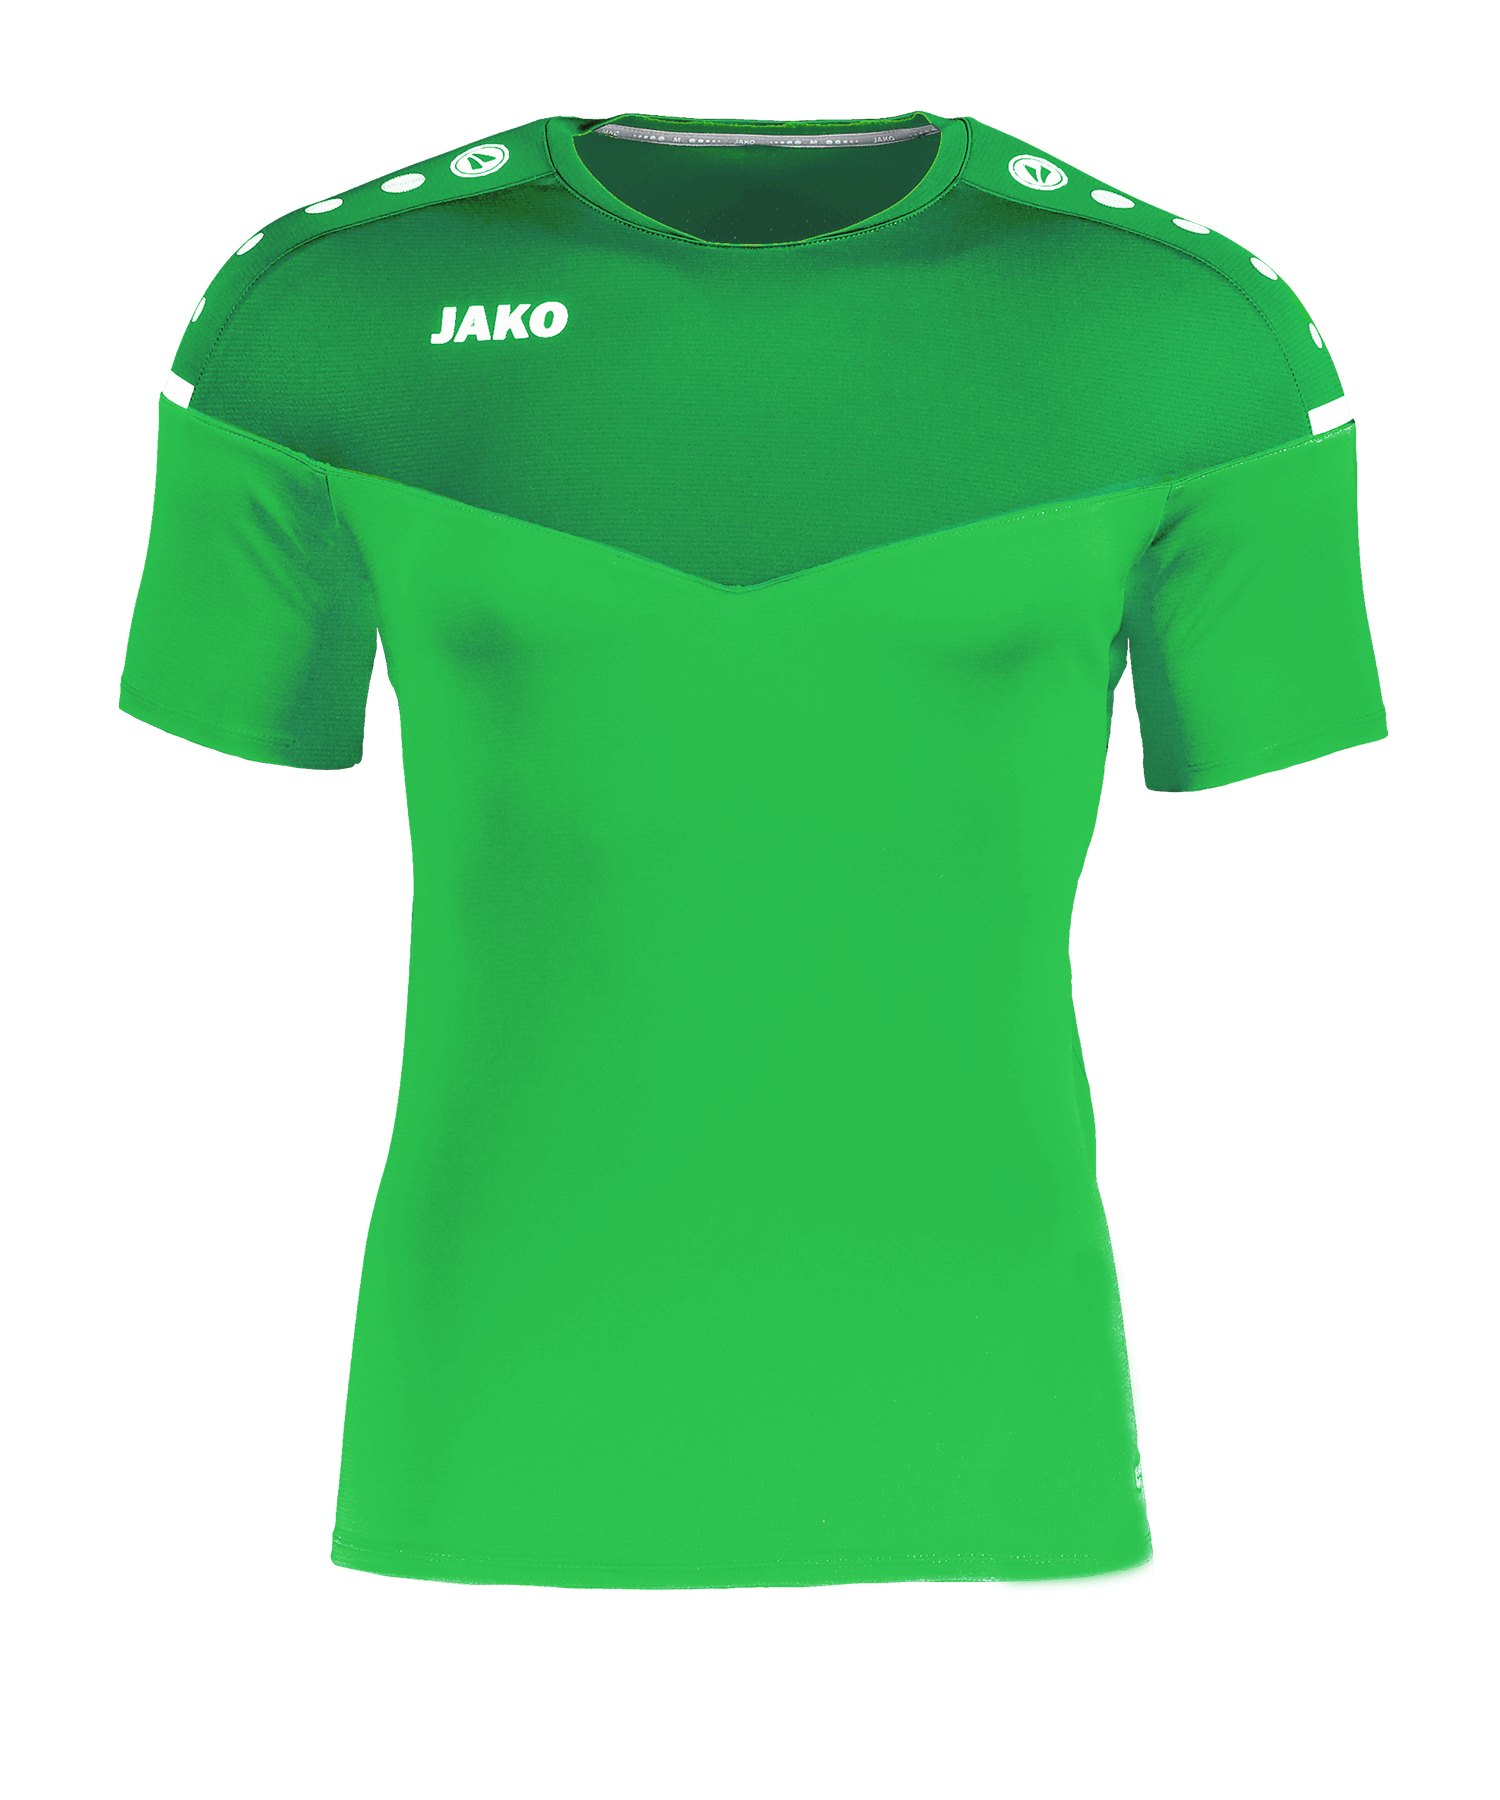 Jako Champ 2.0 T-Shirt Damen Grün F22 - Gruen